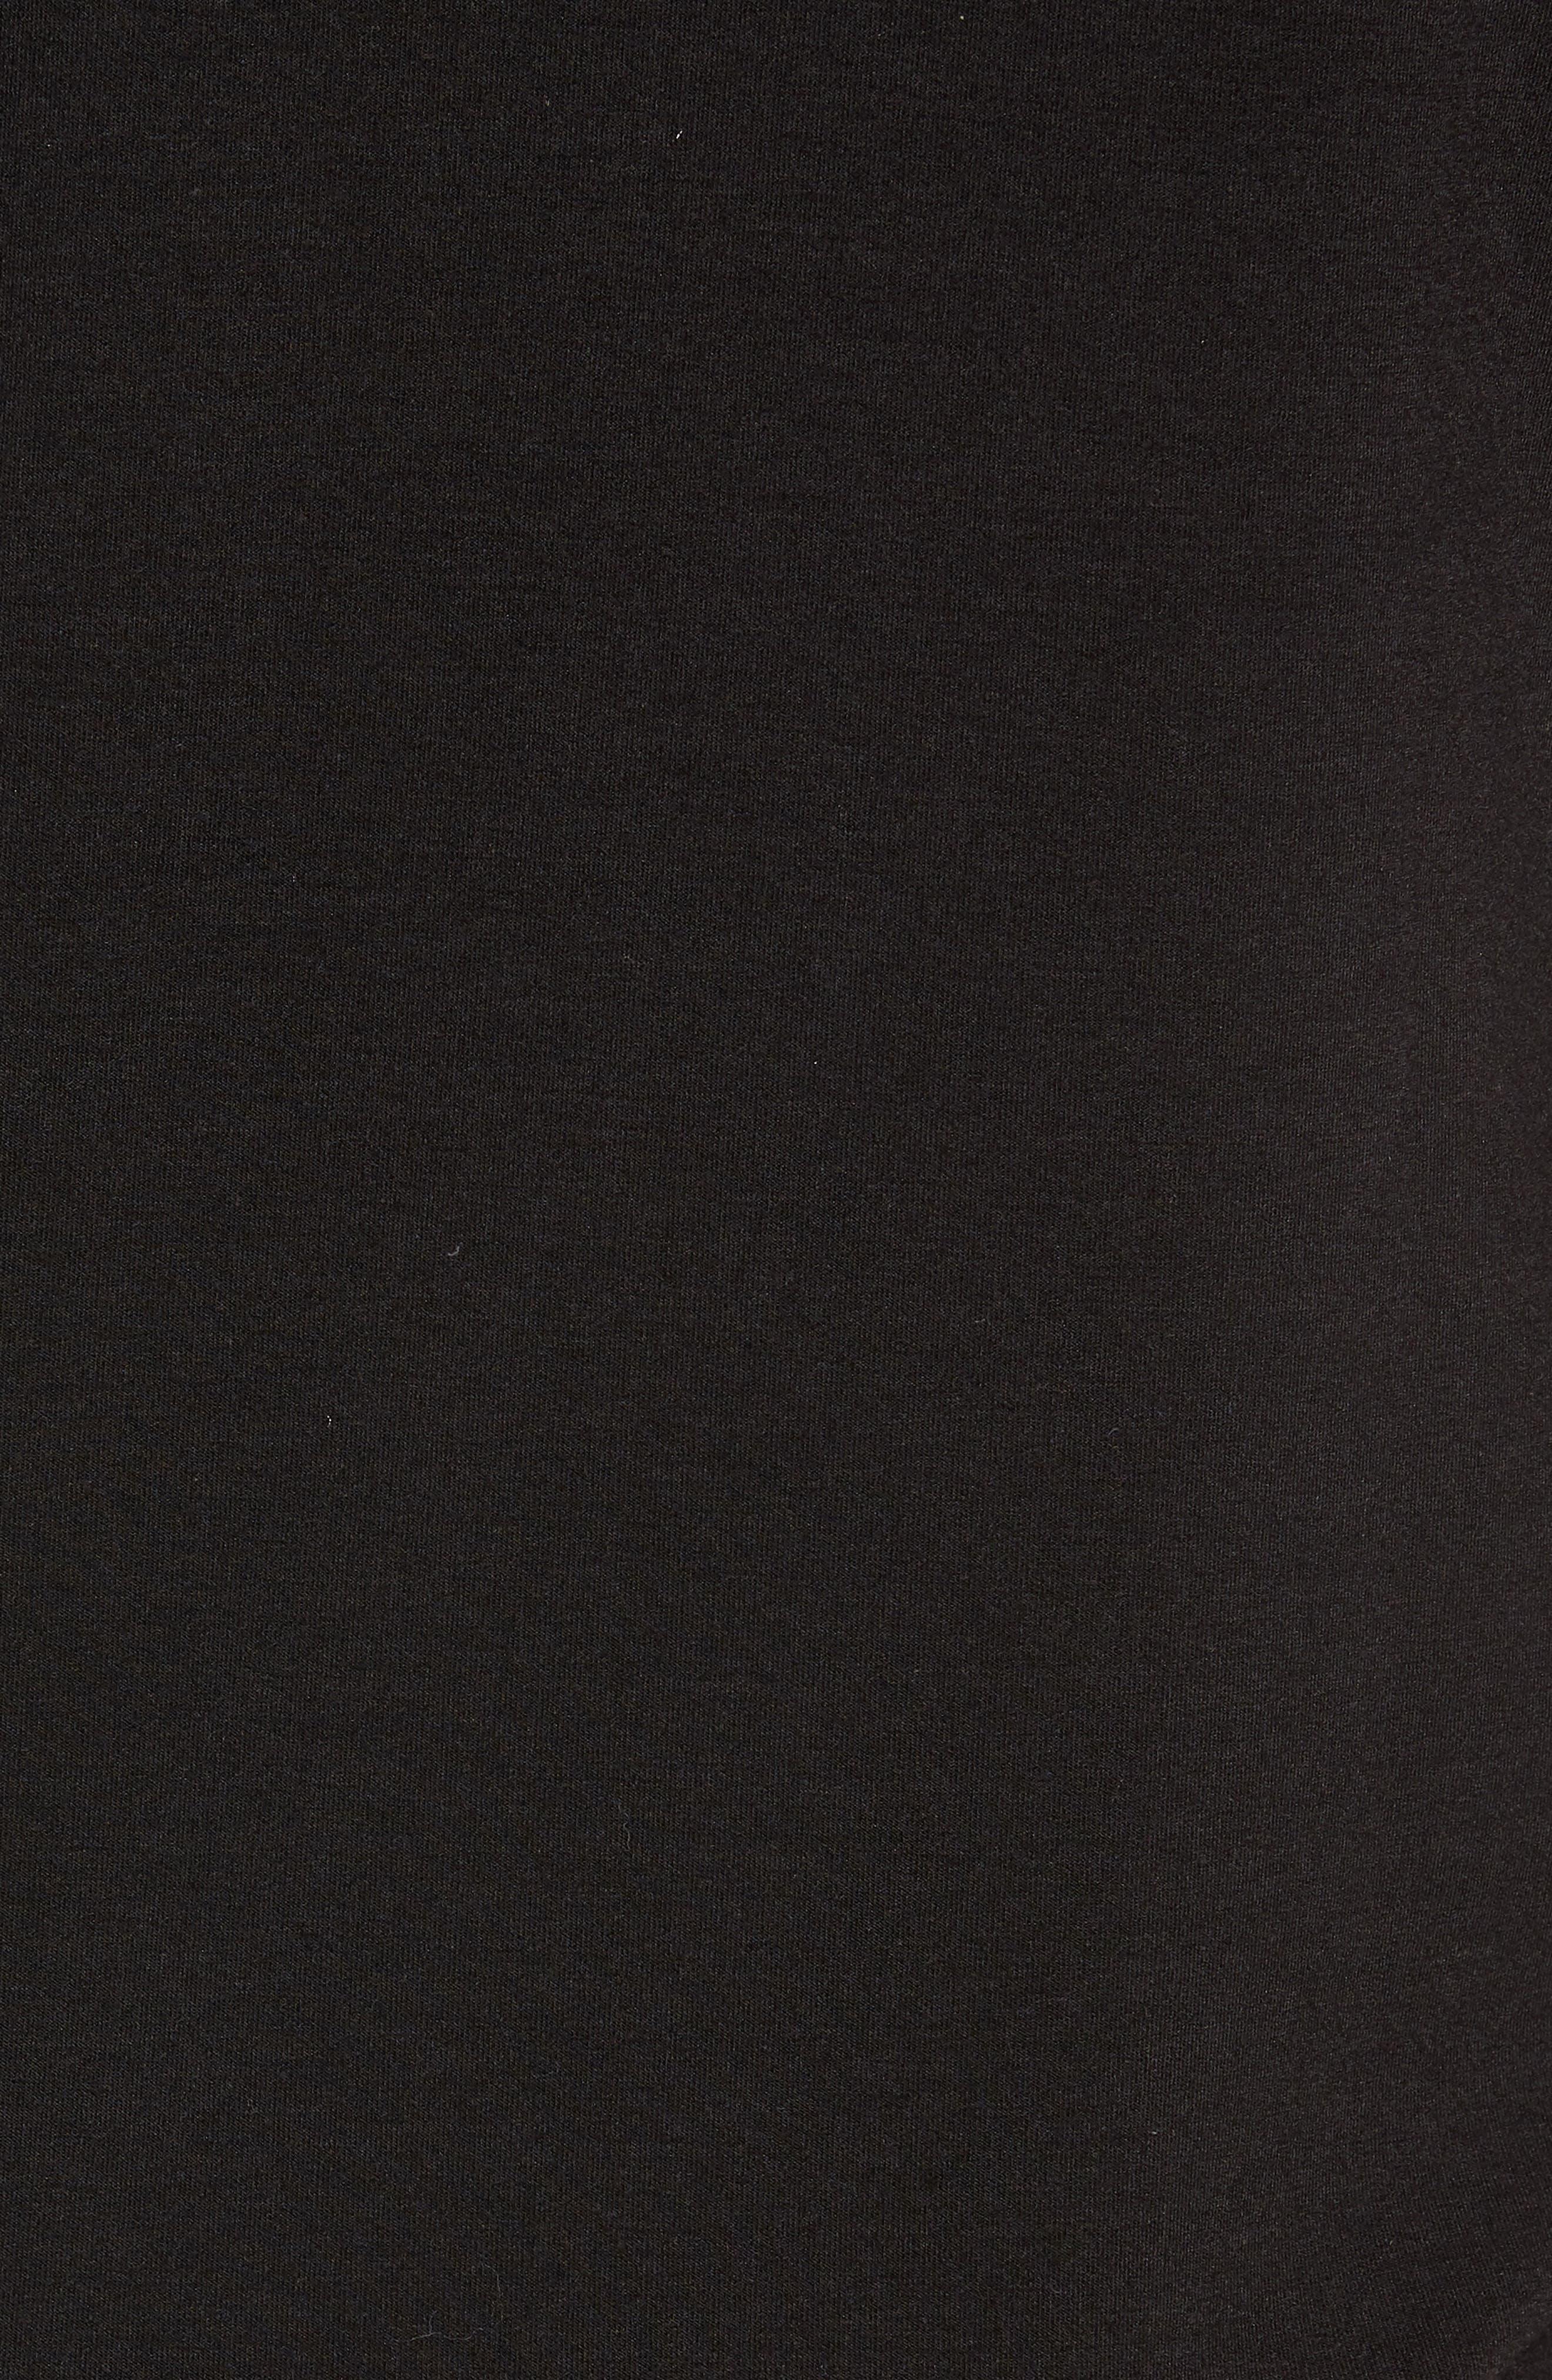 Peper Trim Fit Half Zip Pullover,                             Alternate thumbnail 5, color,                             001